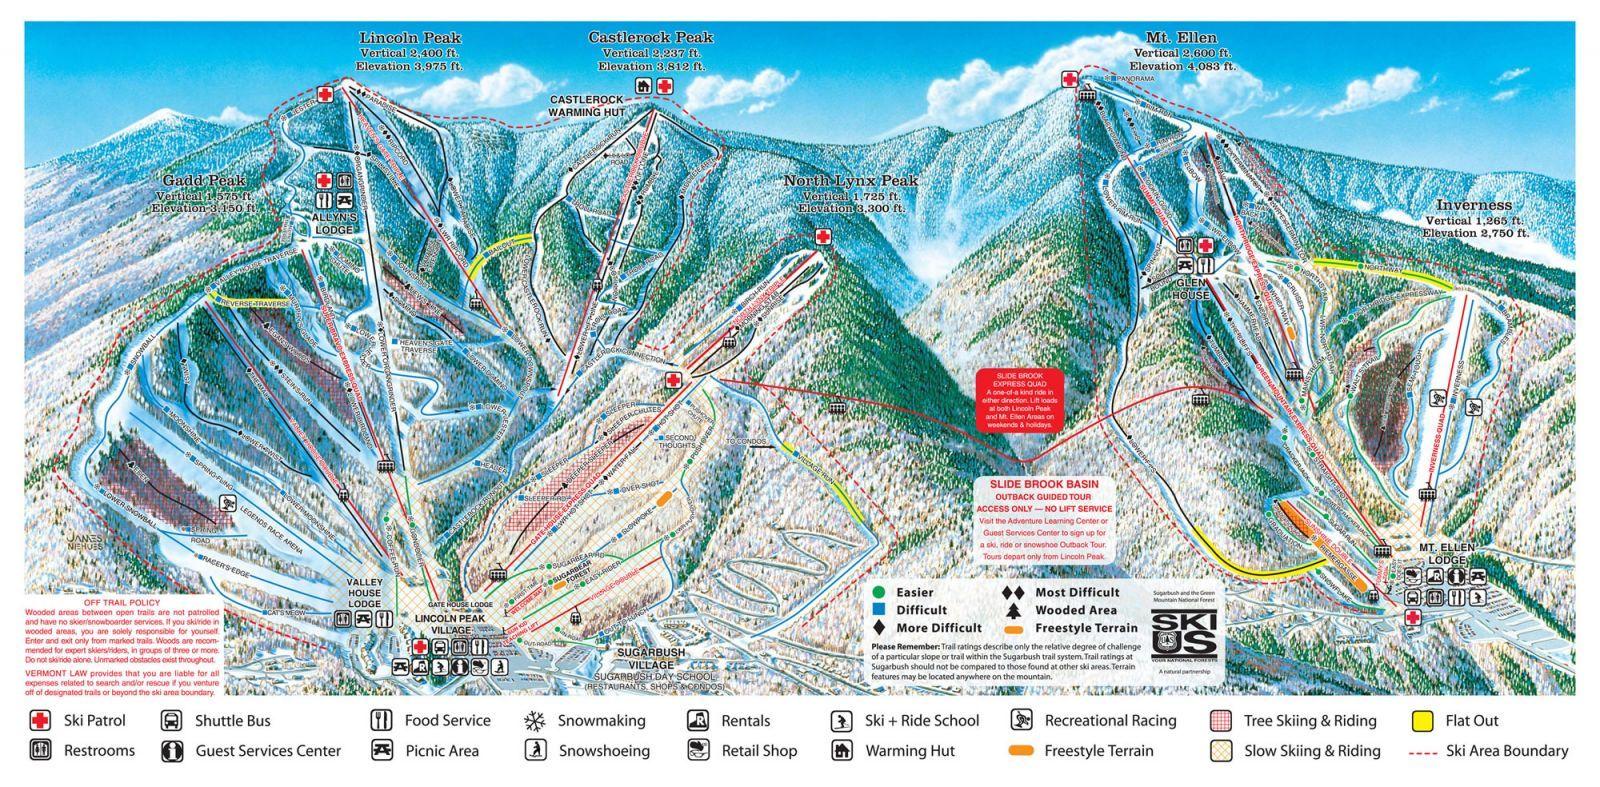 Lincoln Peak Ski Trip Resort Skiing